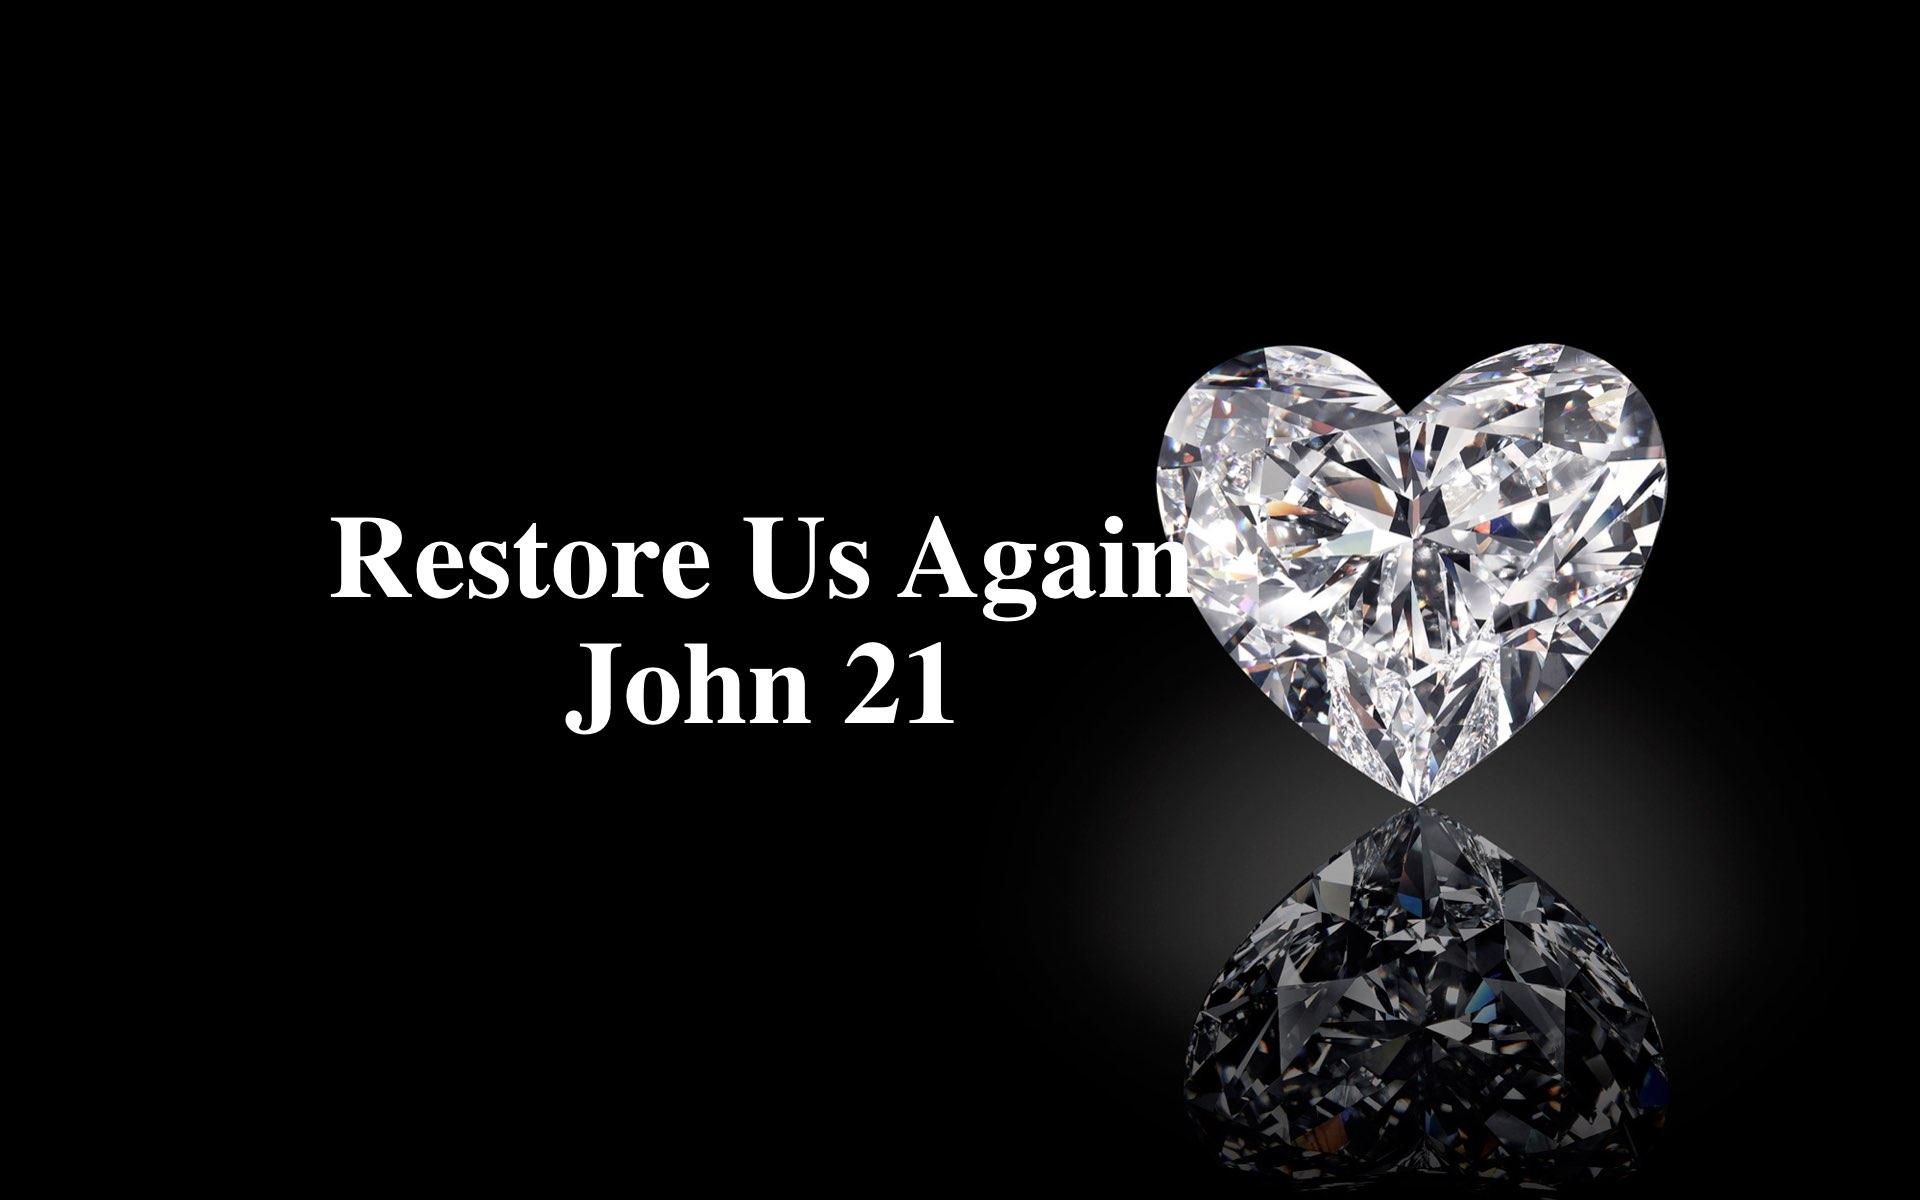 Restore Us Again